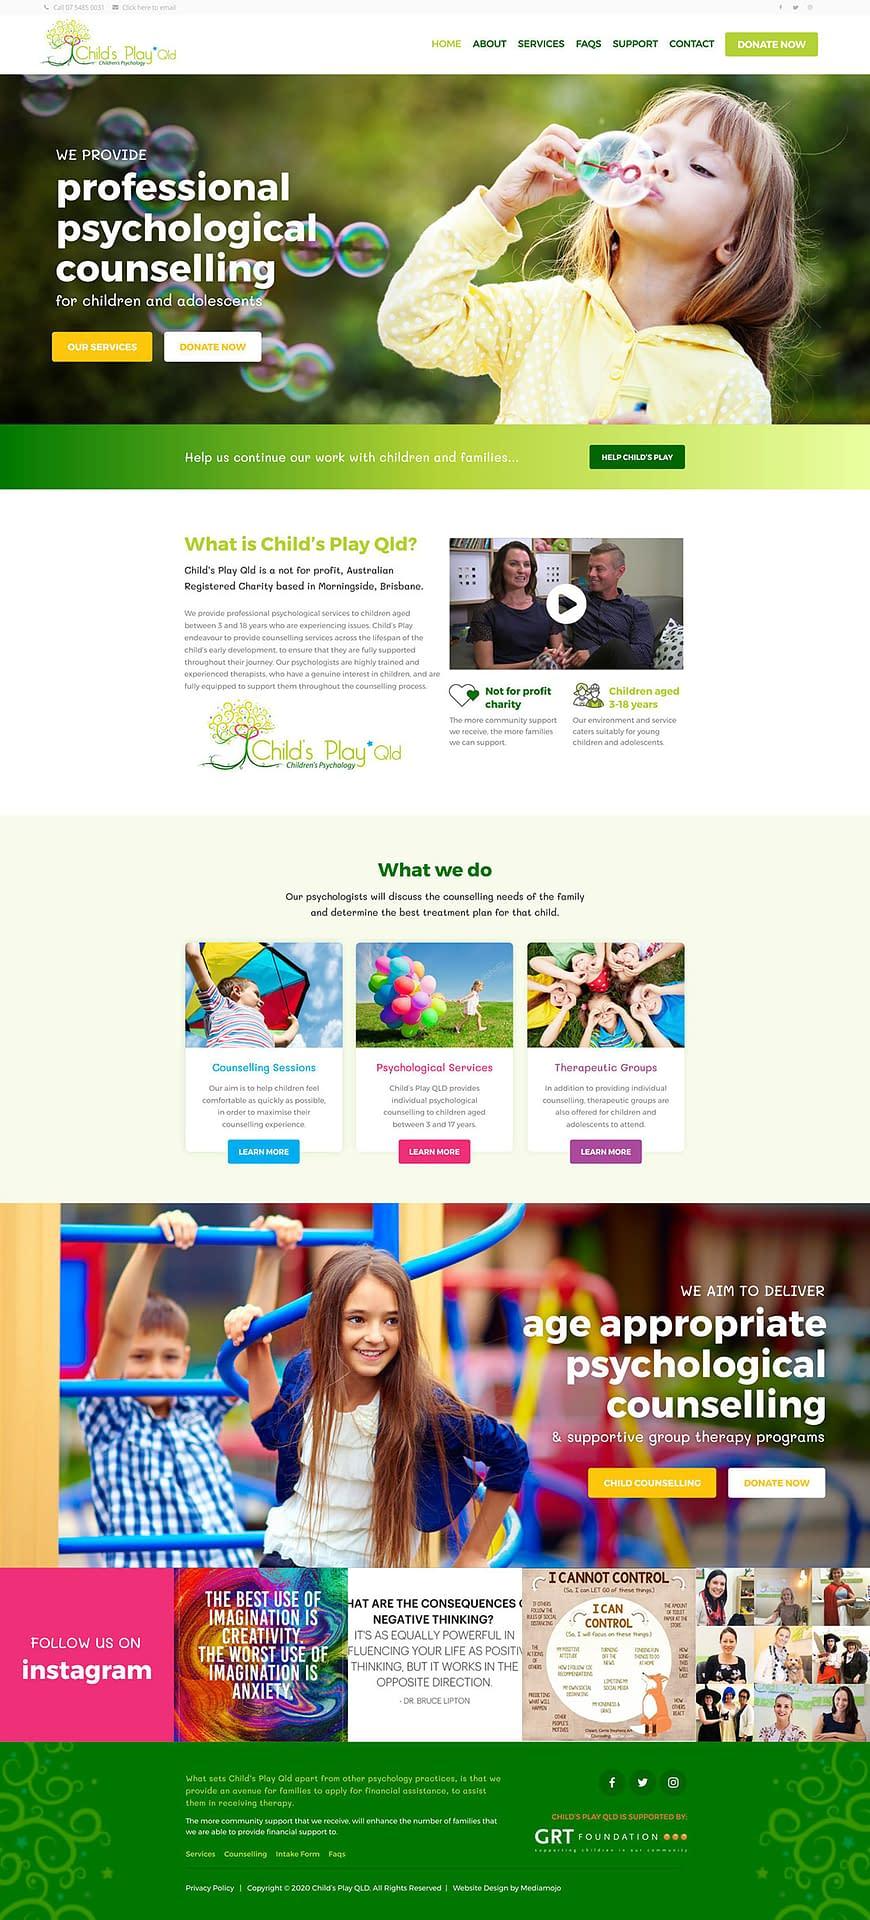 Child's Play Qld website design